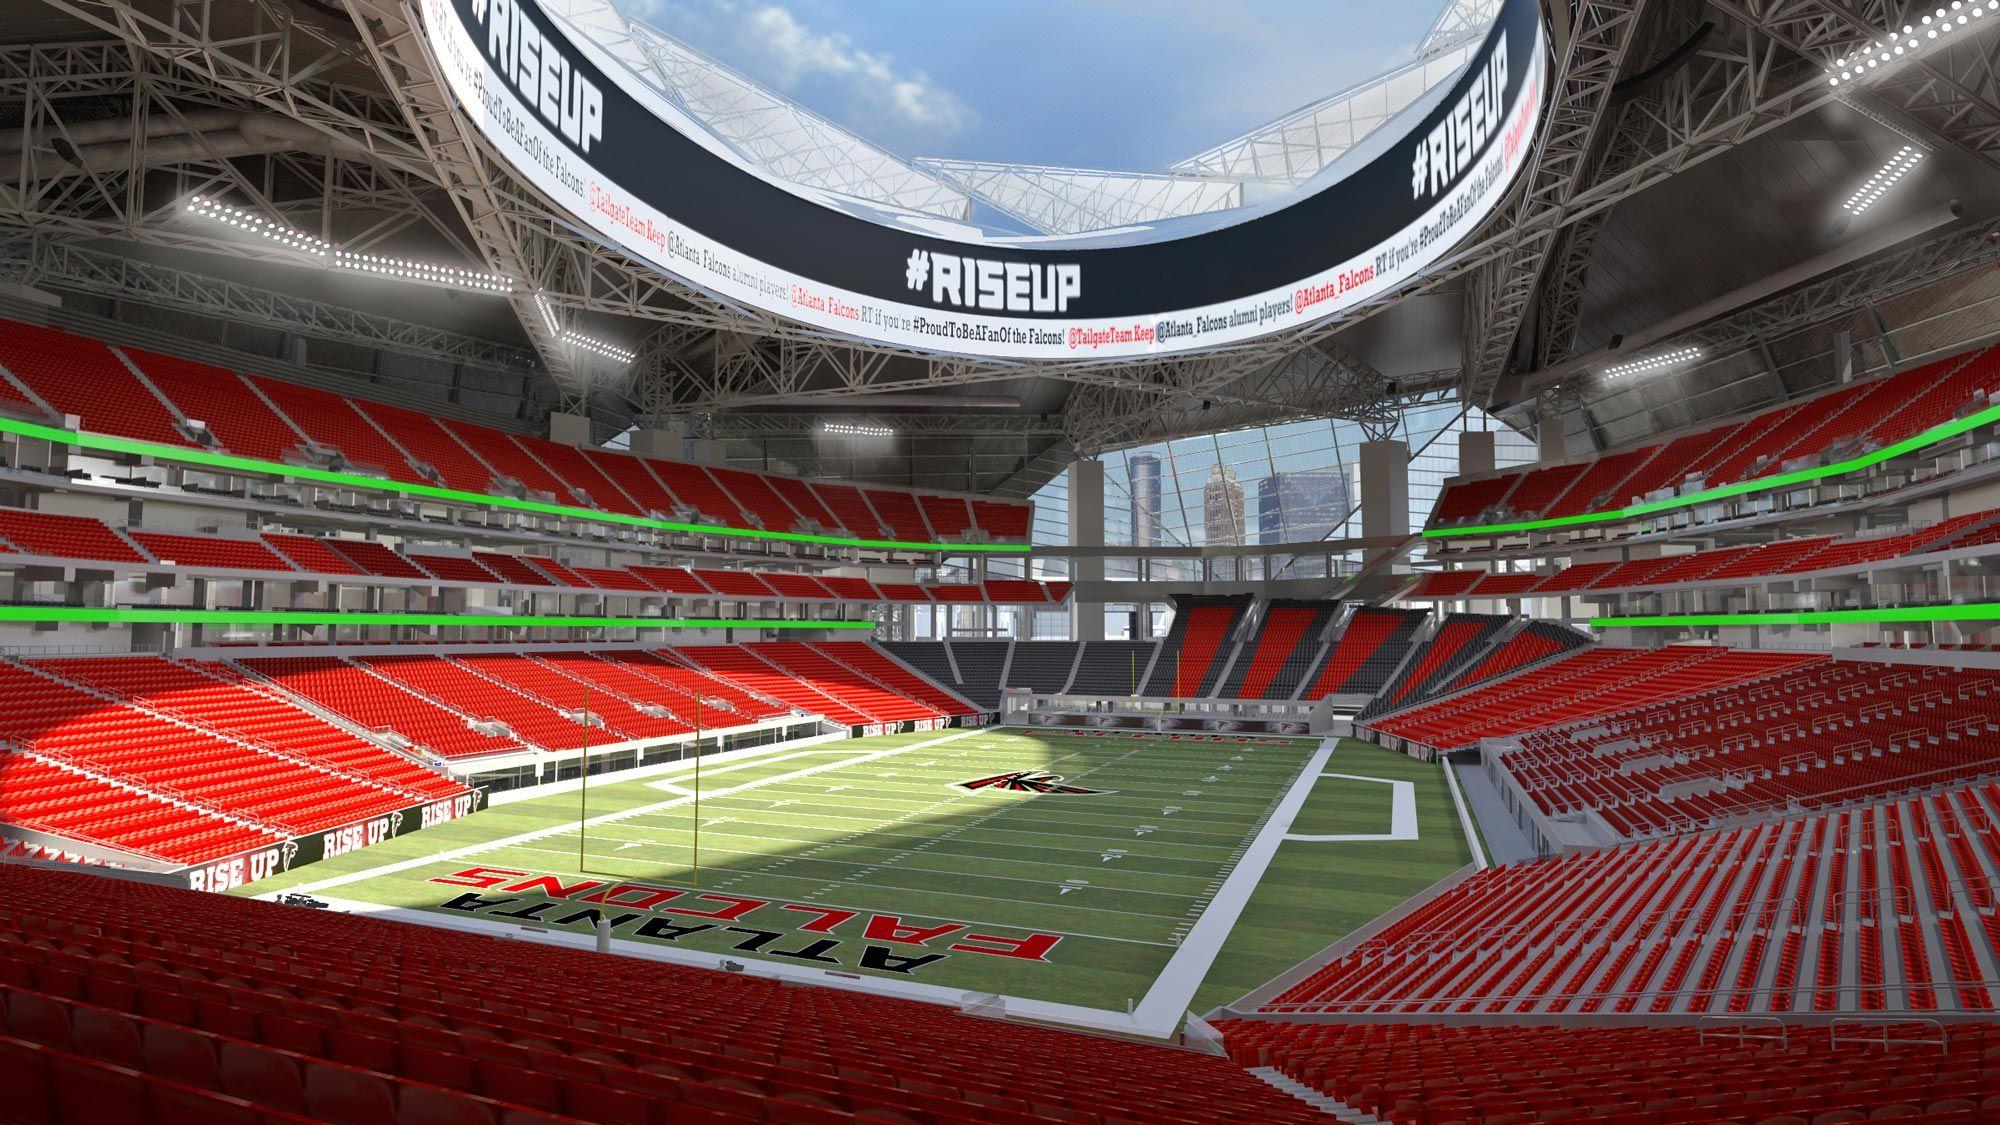 New Atlanta Stadium Overview New Atlanta Stadium Atlanta Falcons Stadium Stadium Atlanta